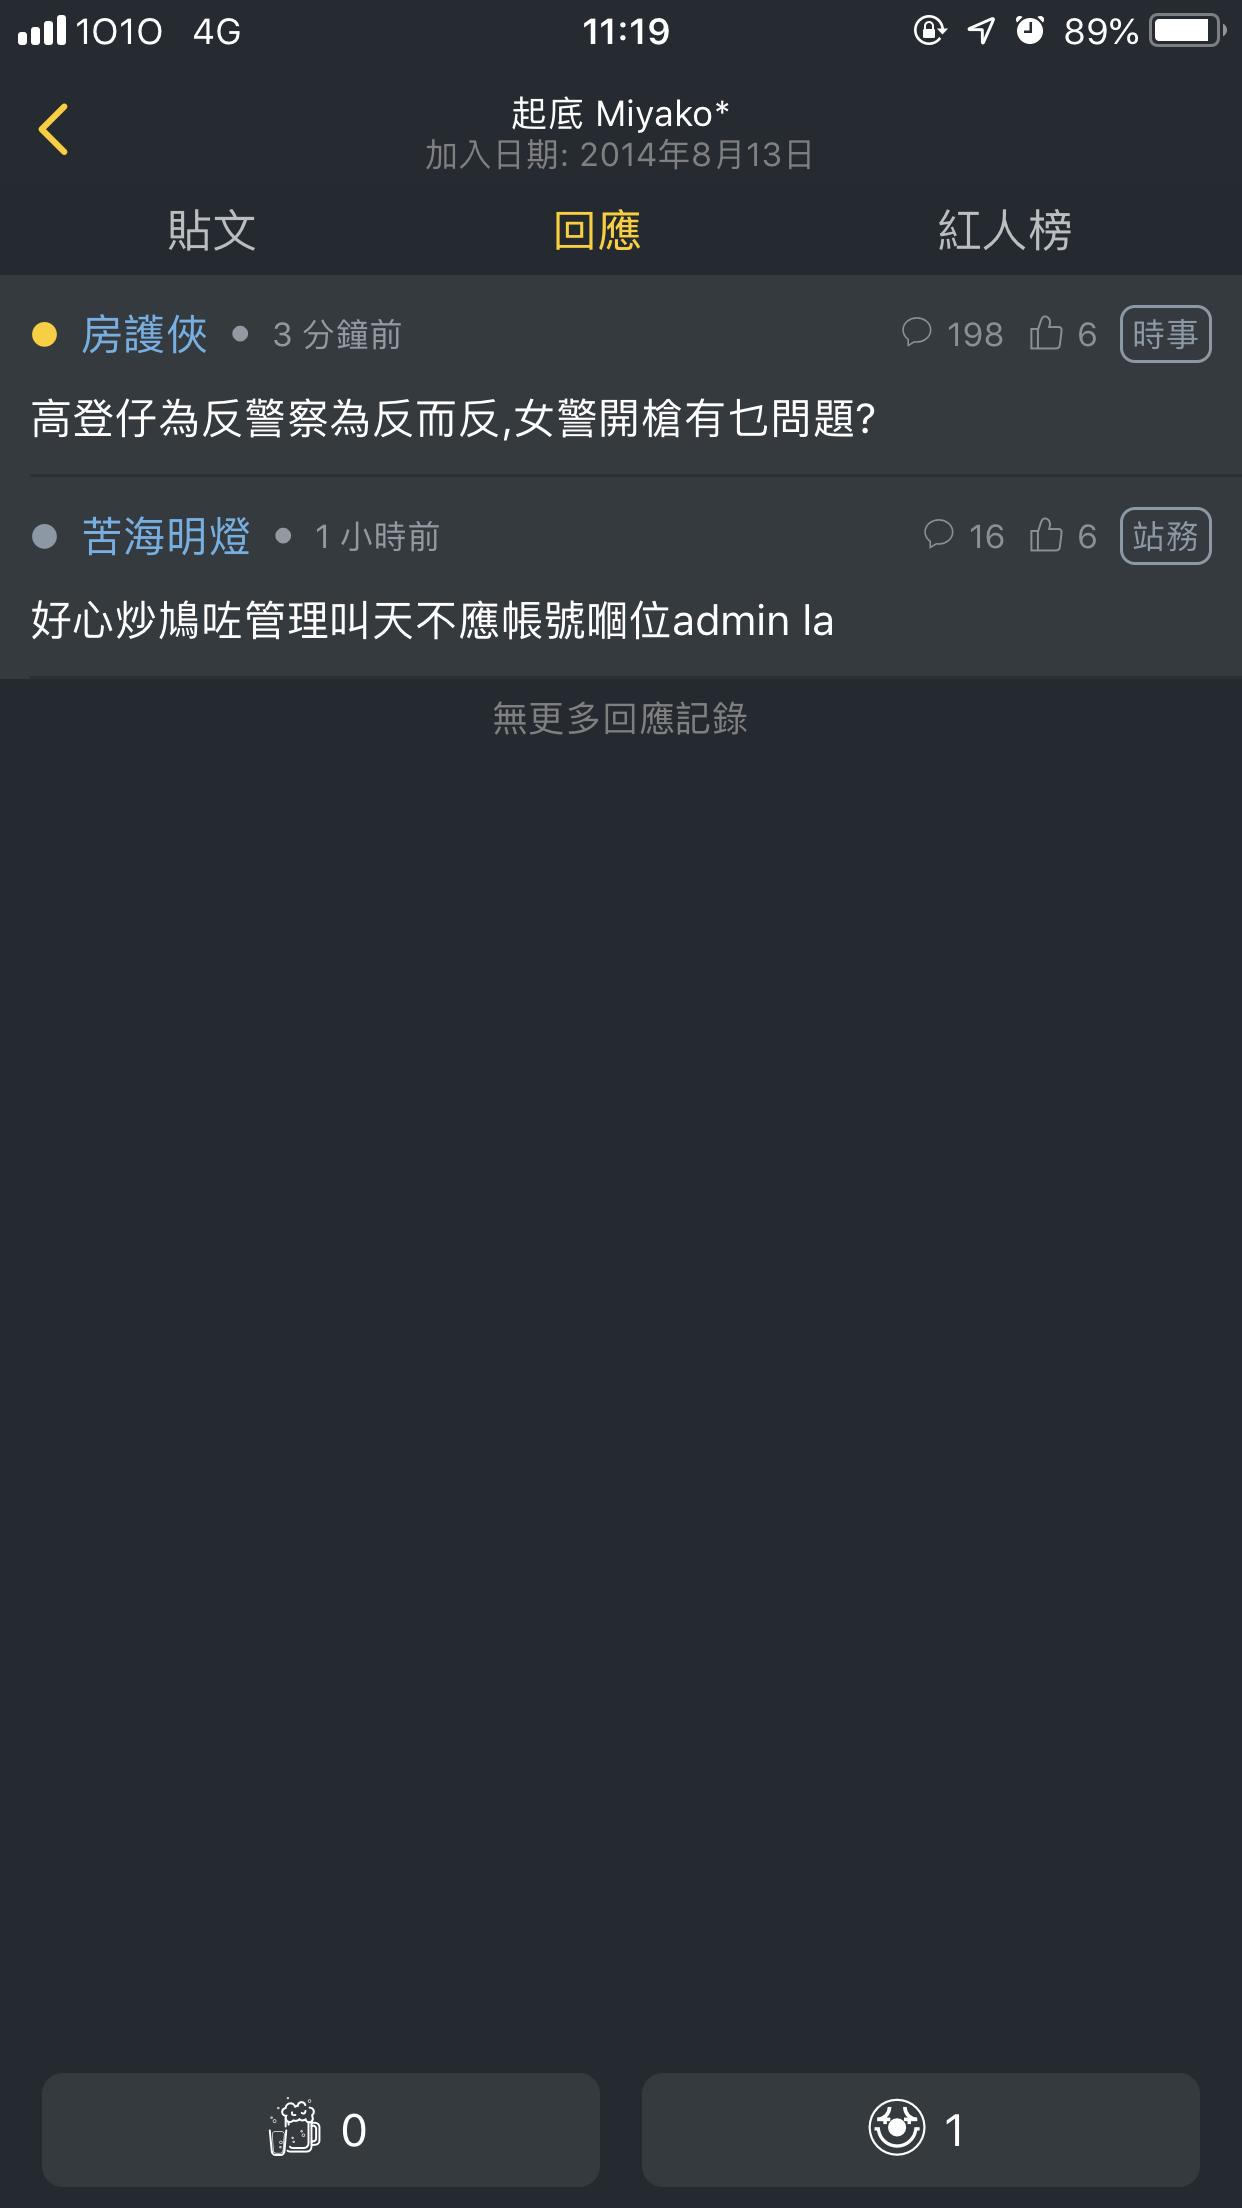 [img]https://upload.cc/i1/2018/11/10/vfy5pD.png[/img]